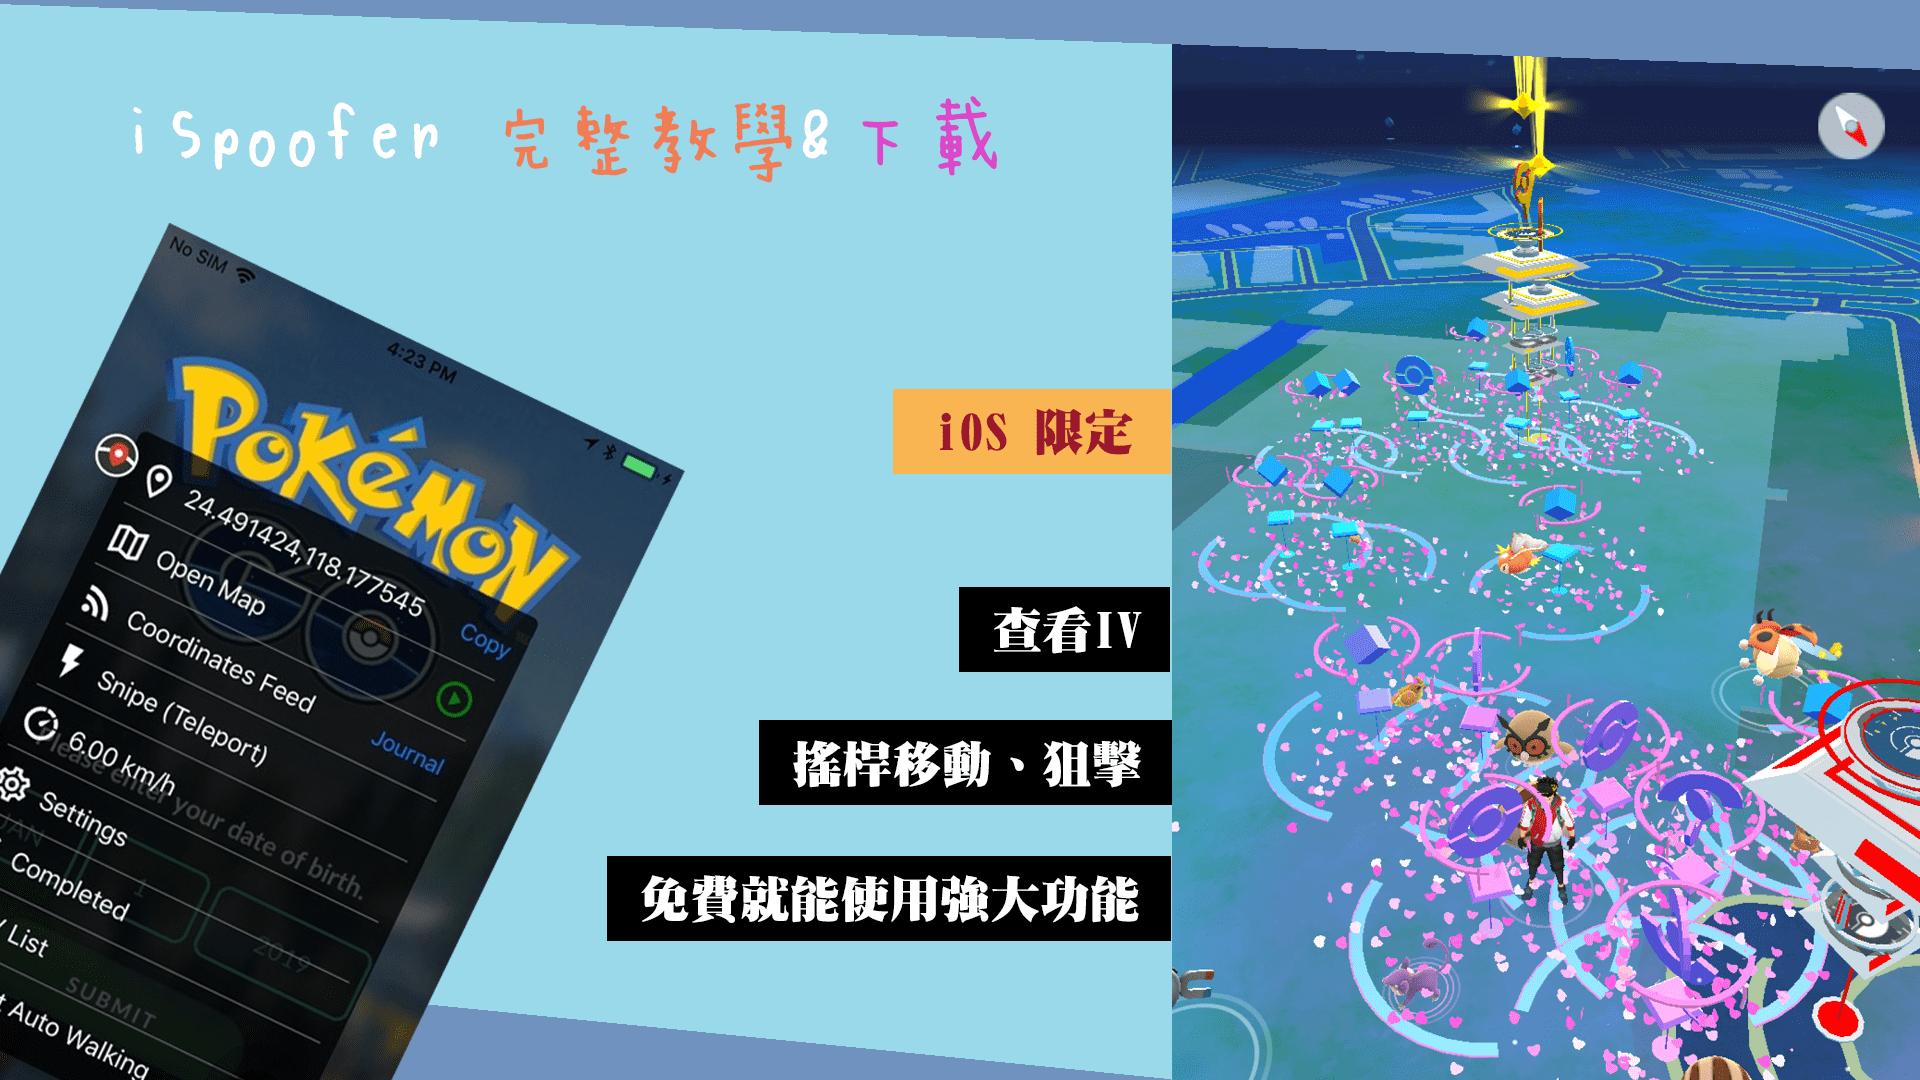 Pokemon Go 外掛 - iSpoofer 飛人狙擊完整教學與下載   妖精的號角